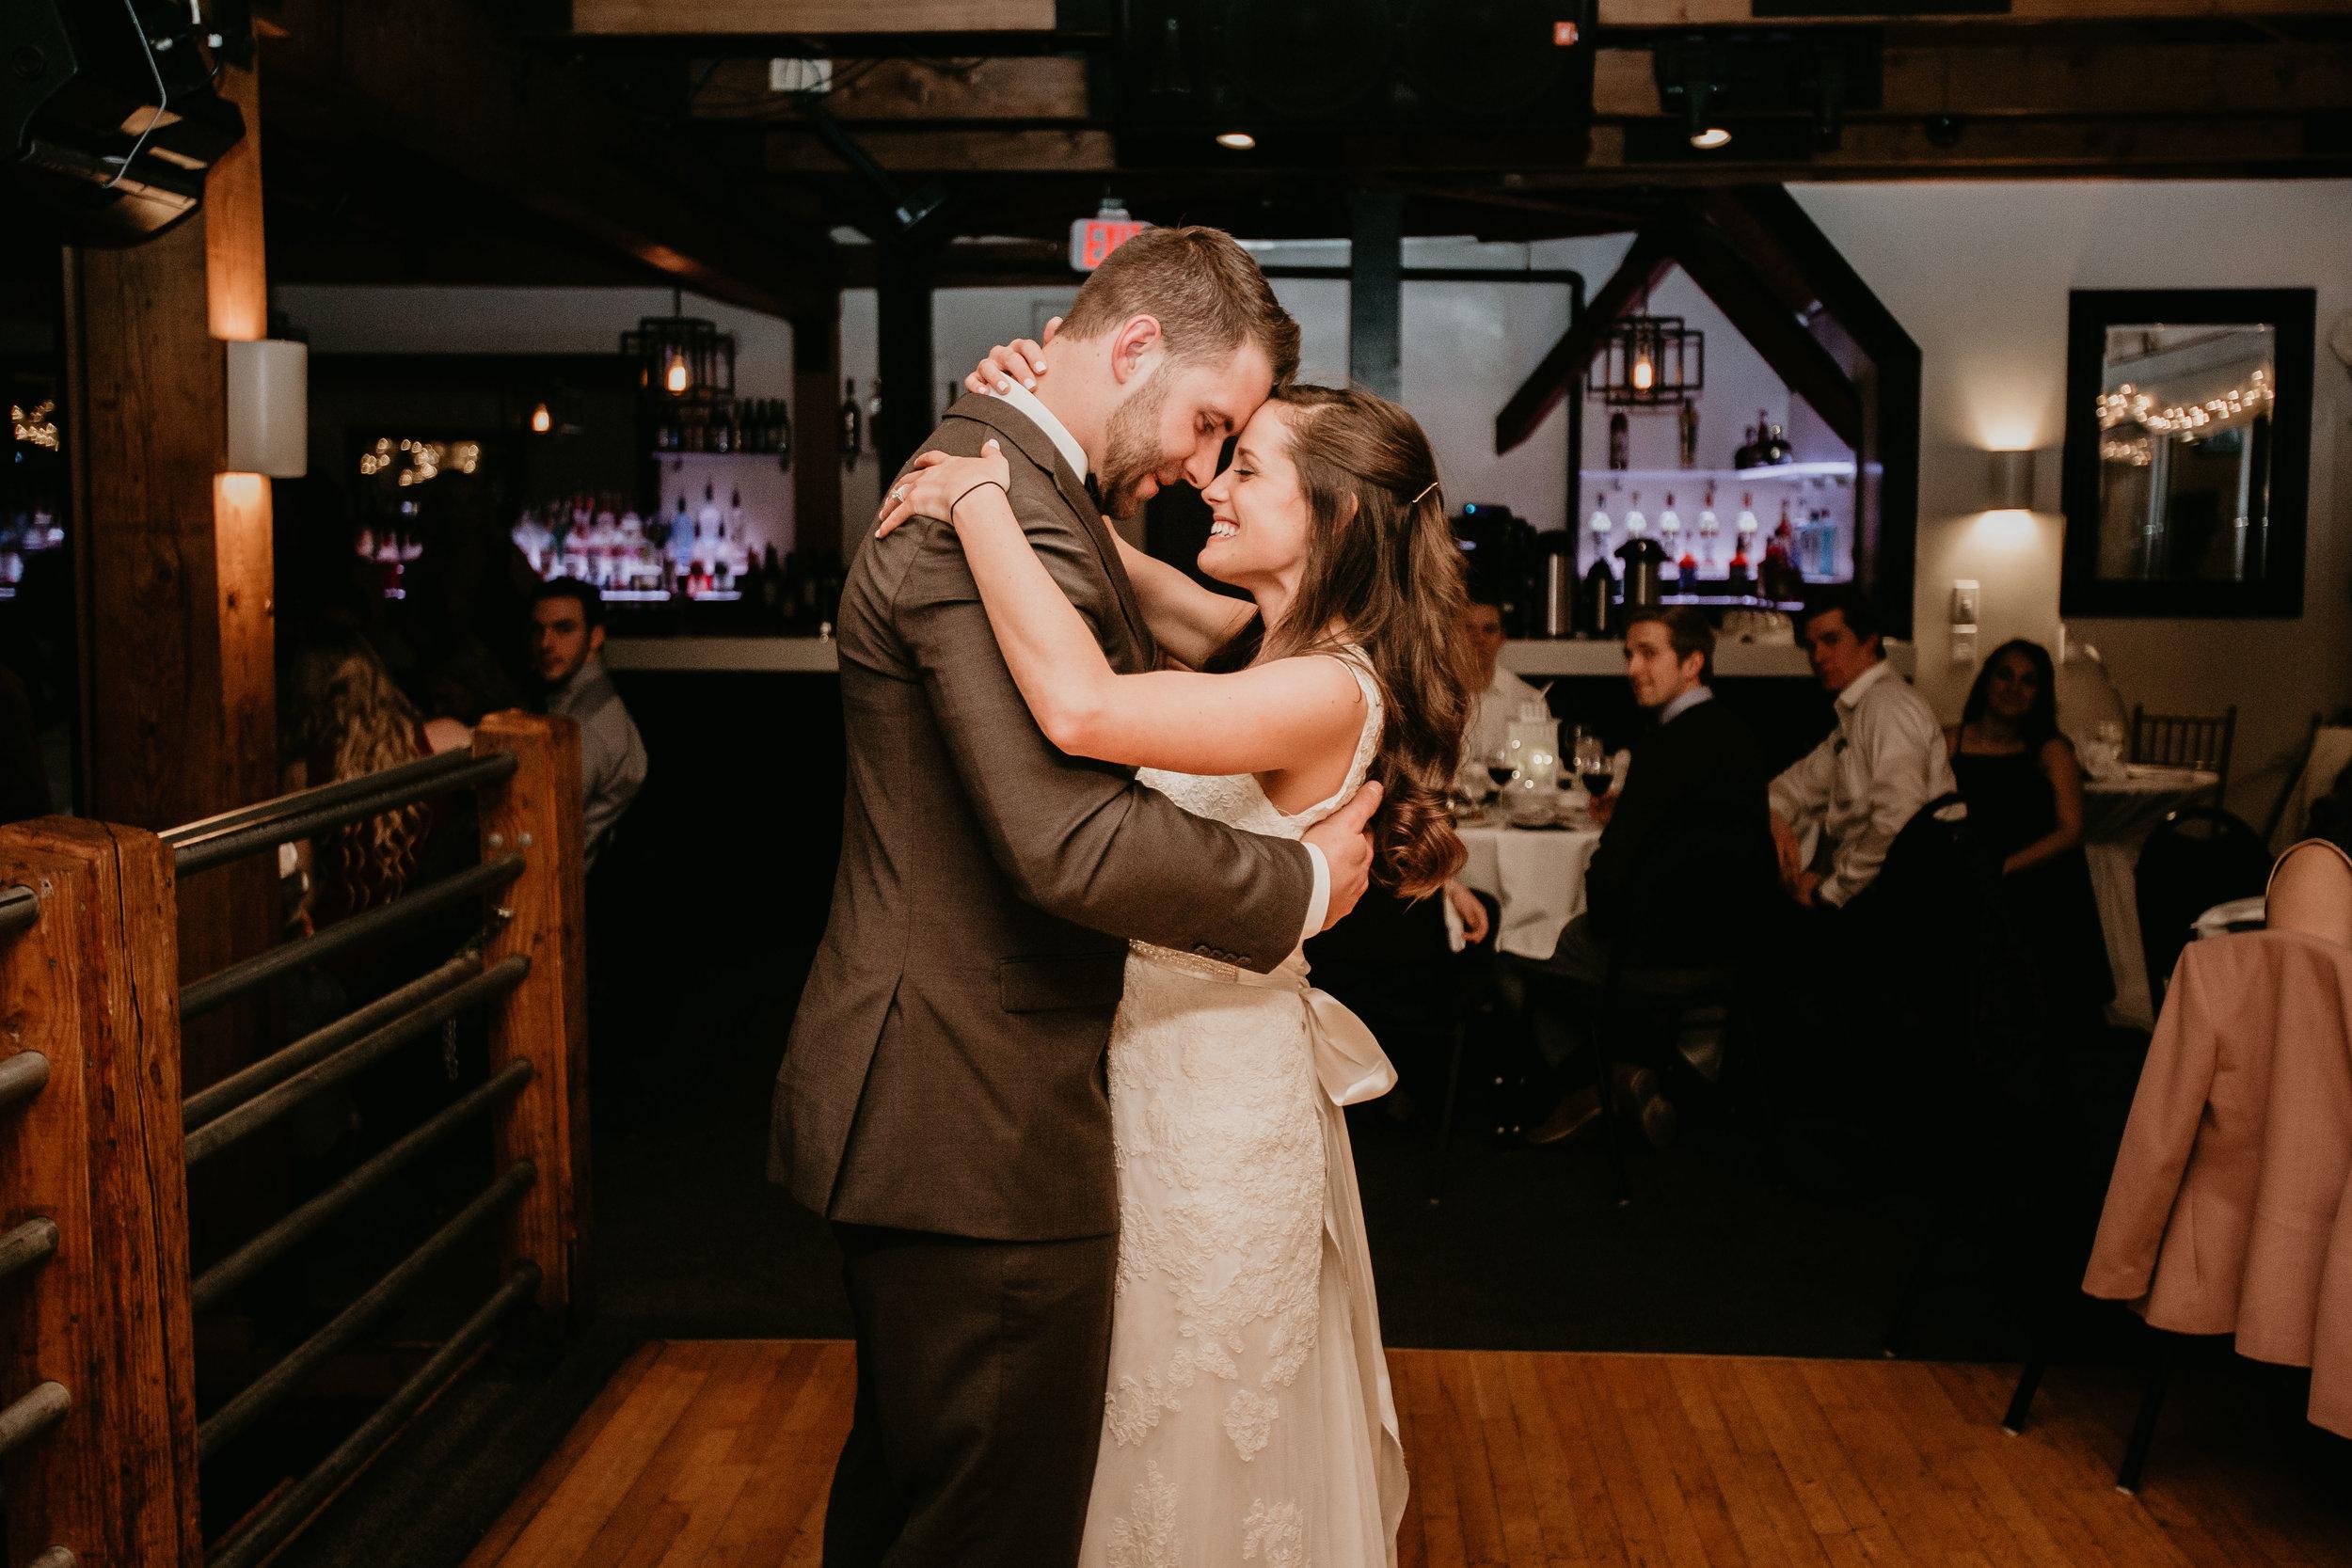 nicole-daacke-photography-boston-massachusetts-seaside-intimate-winter-wedding-photographer-59.jpg